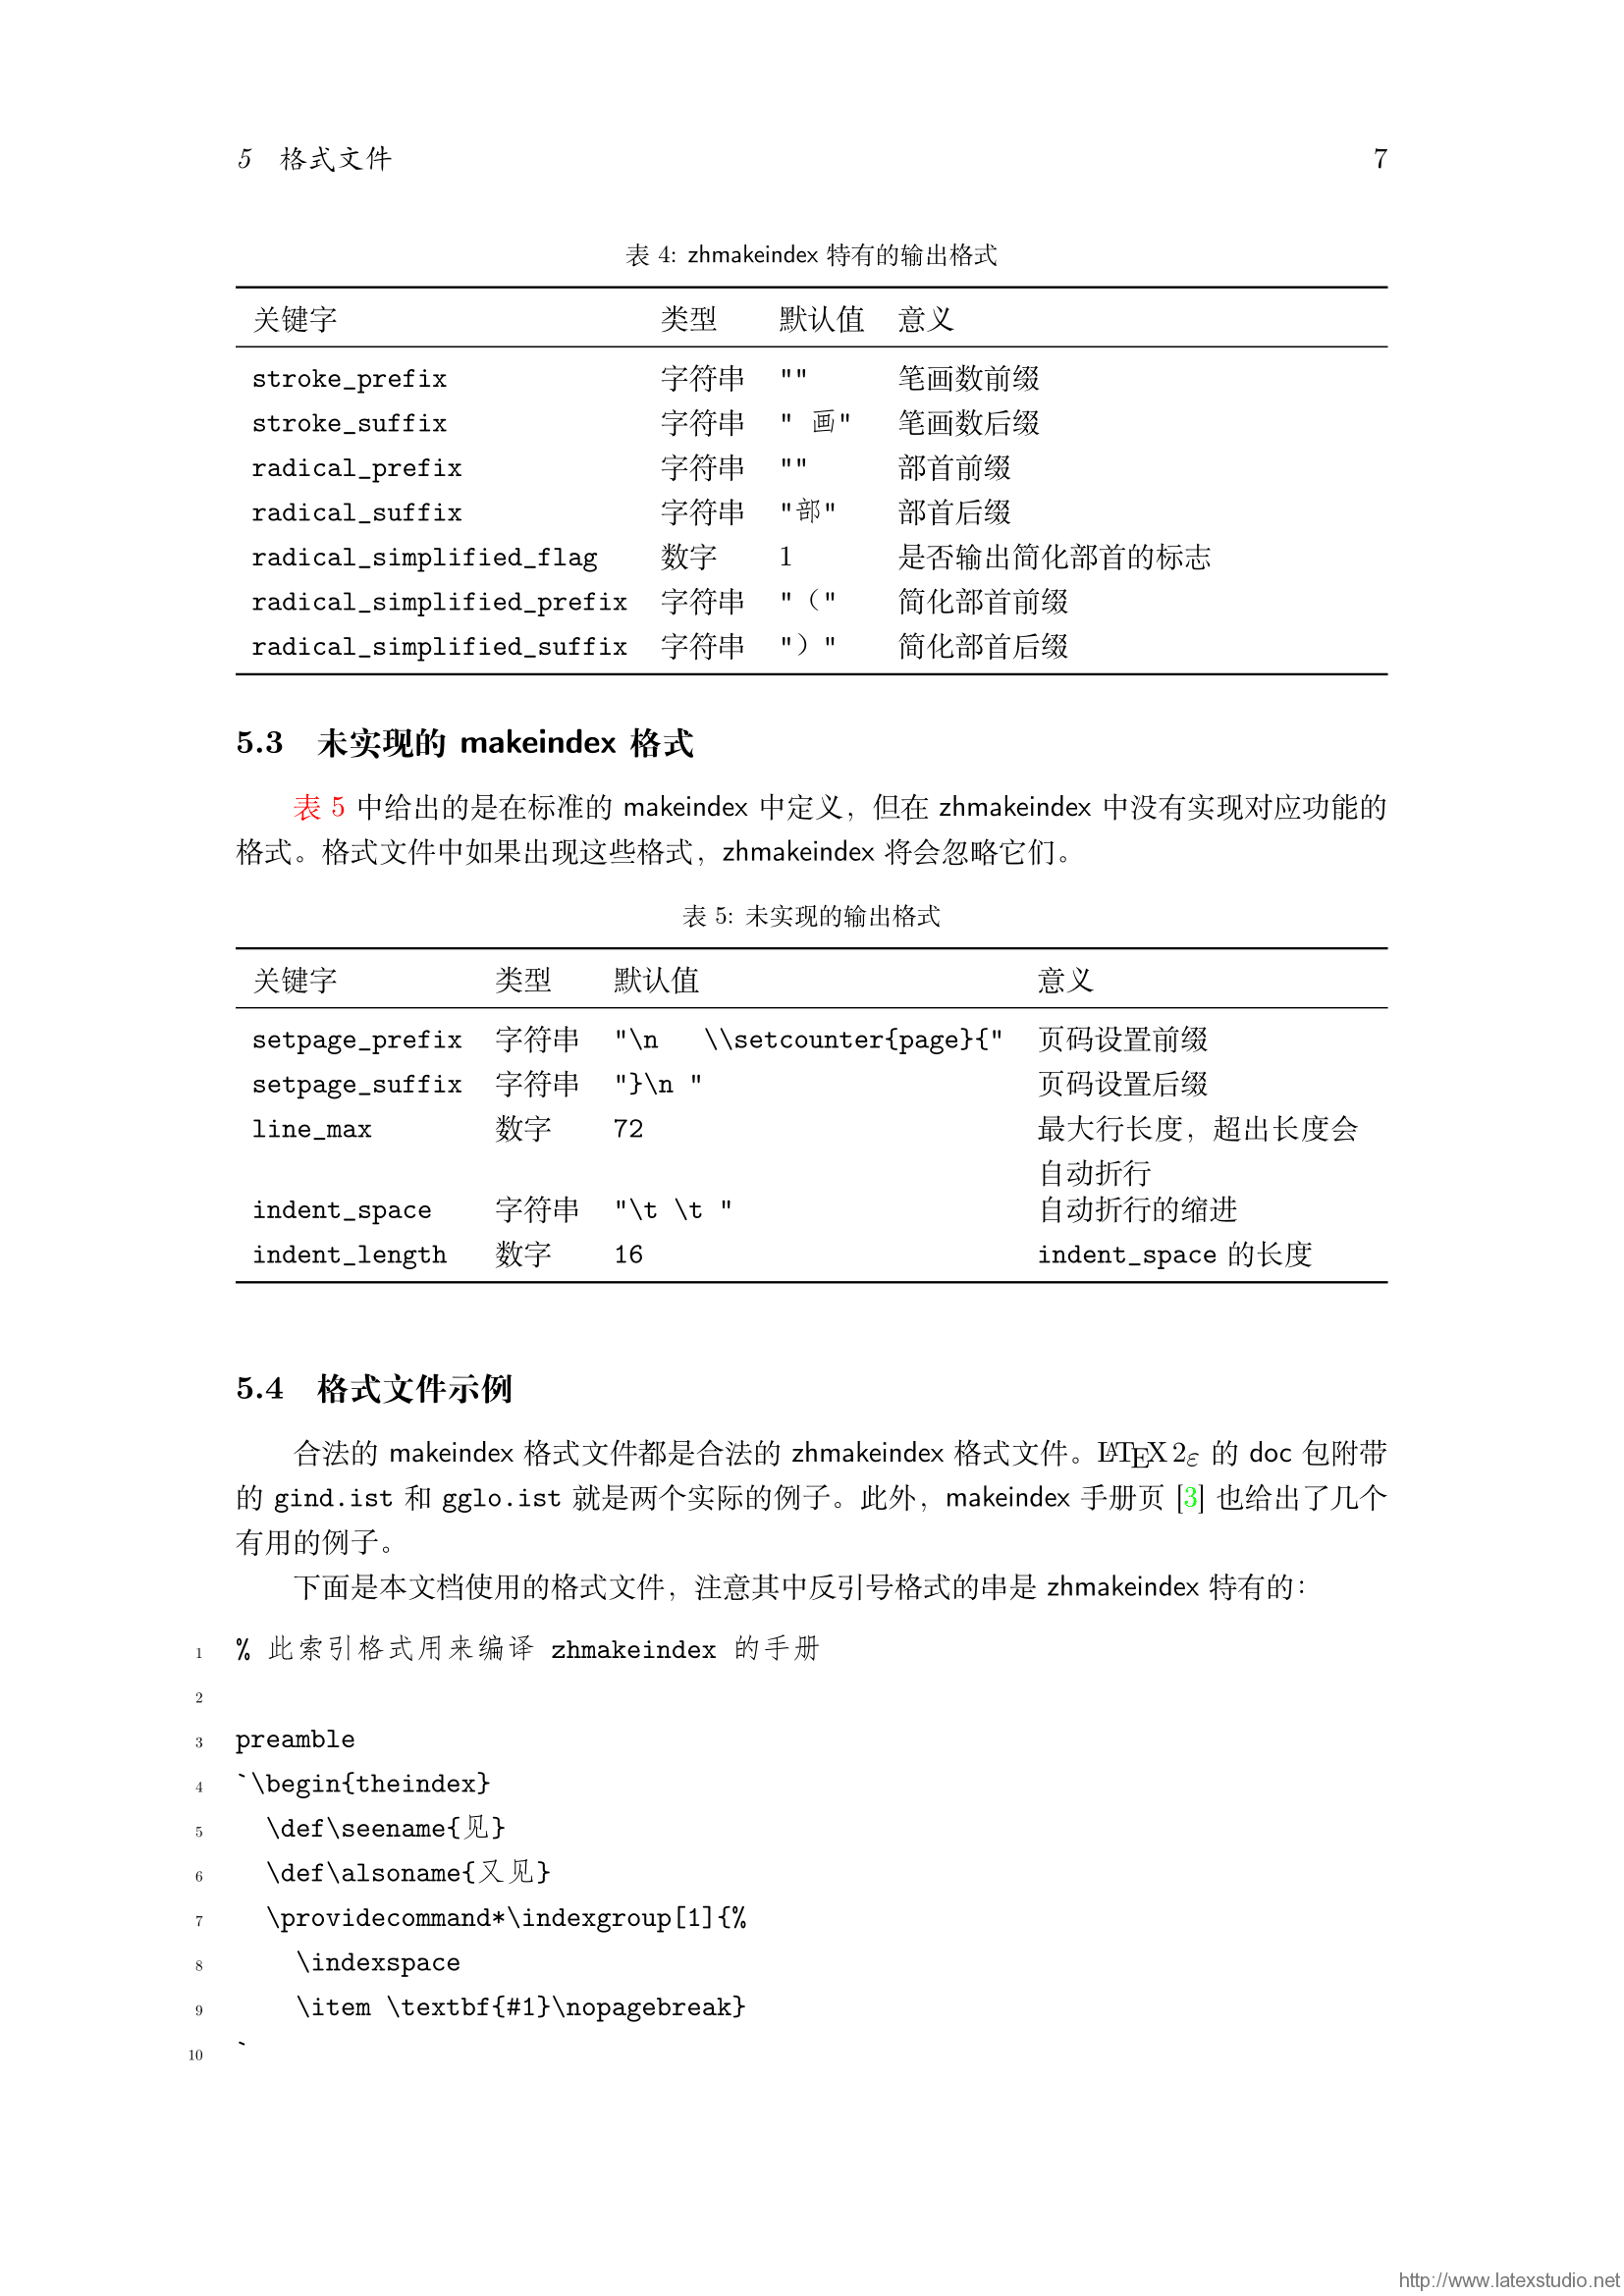 zhmakeindex-07